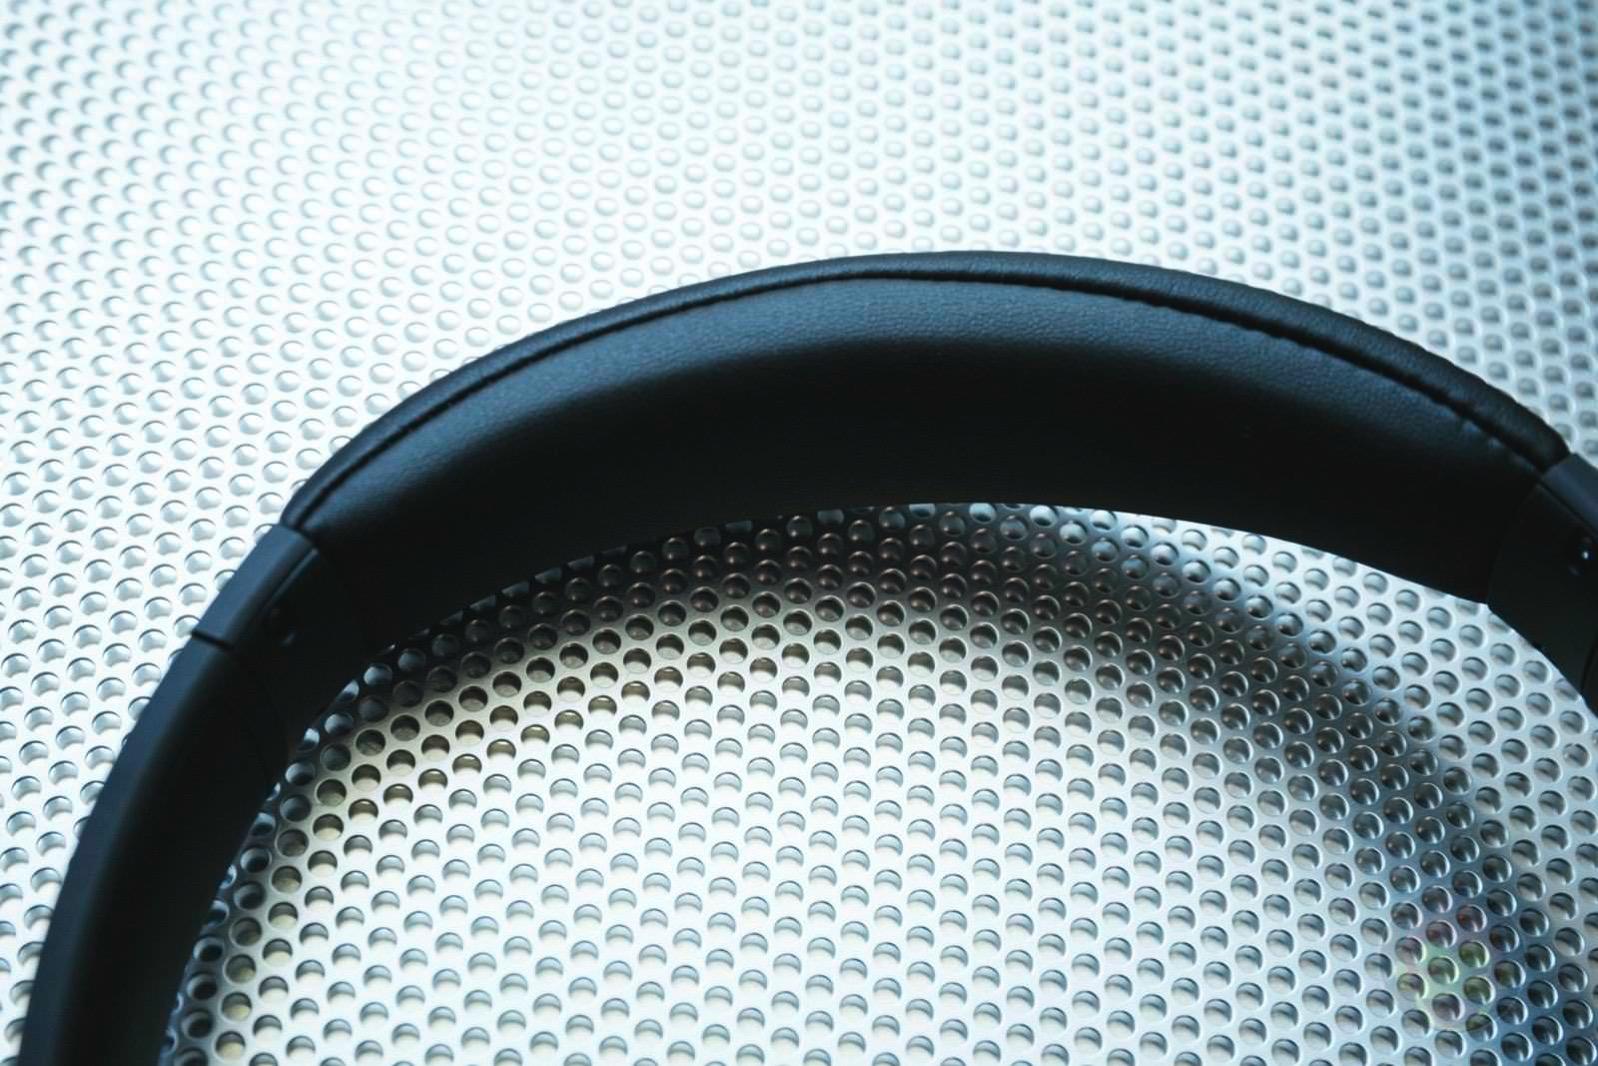 Soundcore-Space-NC-Wireless-Headphones-16.jpg